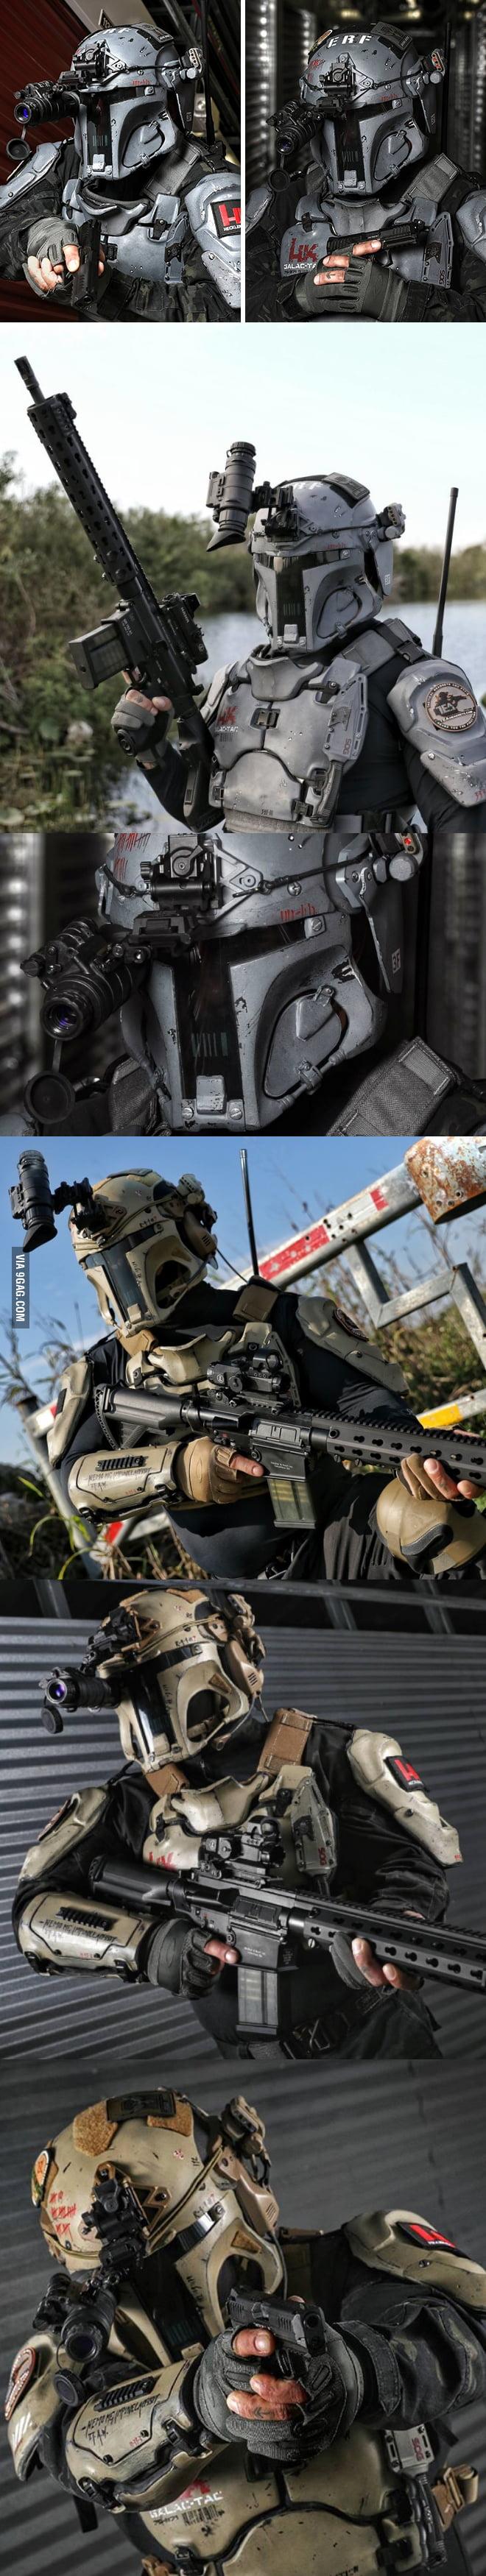 Ballistic Armor Maker AR500 and H&K Produce Real Life Boba